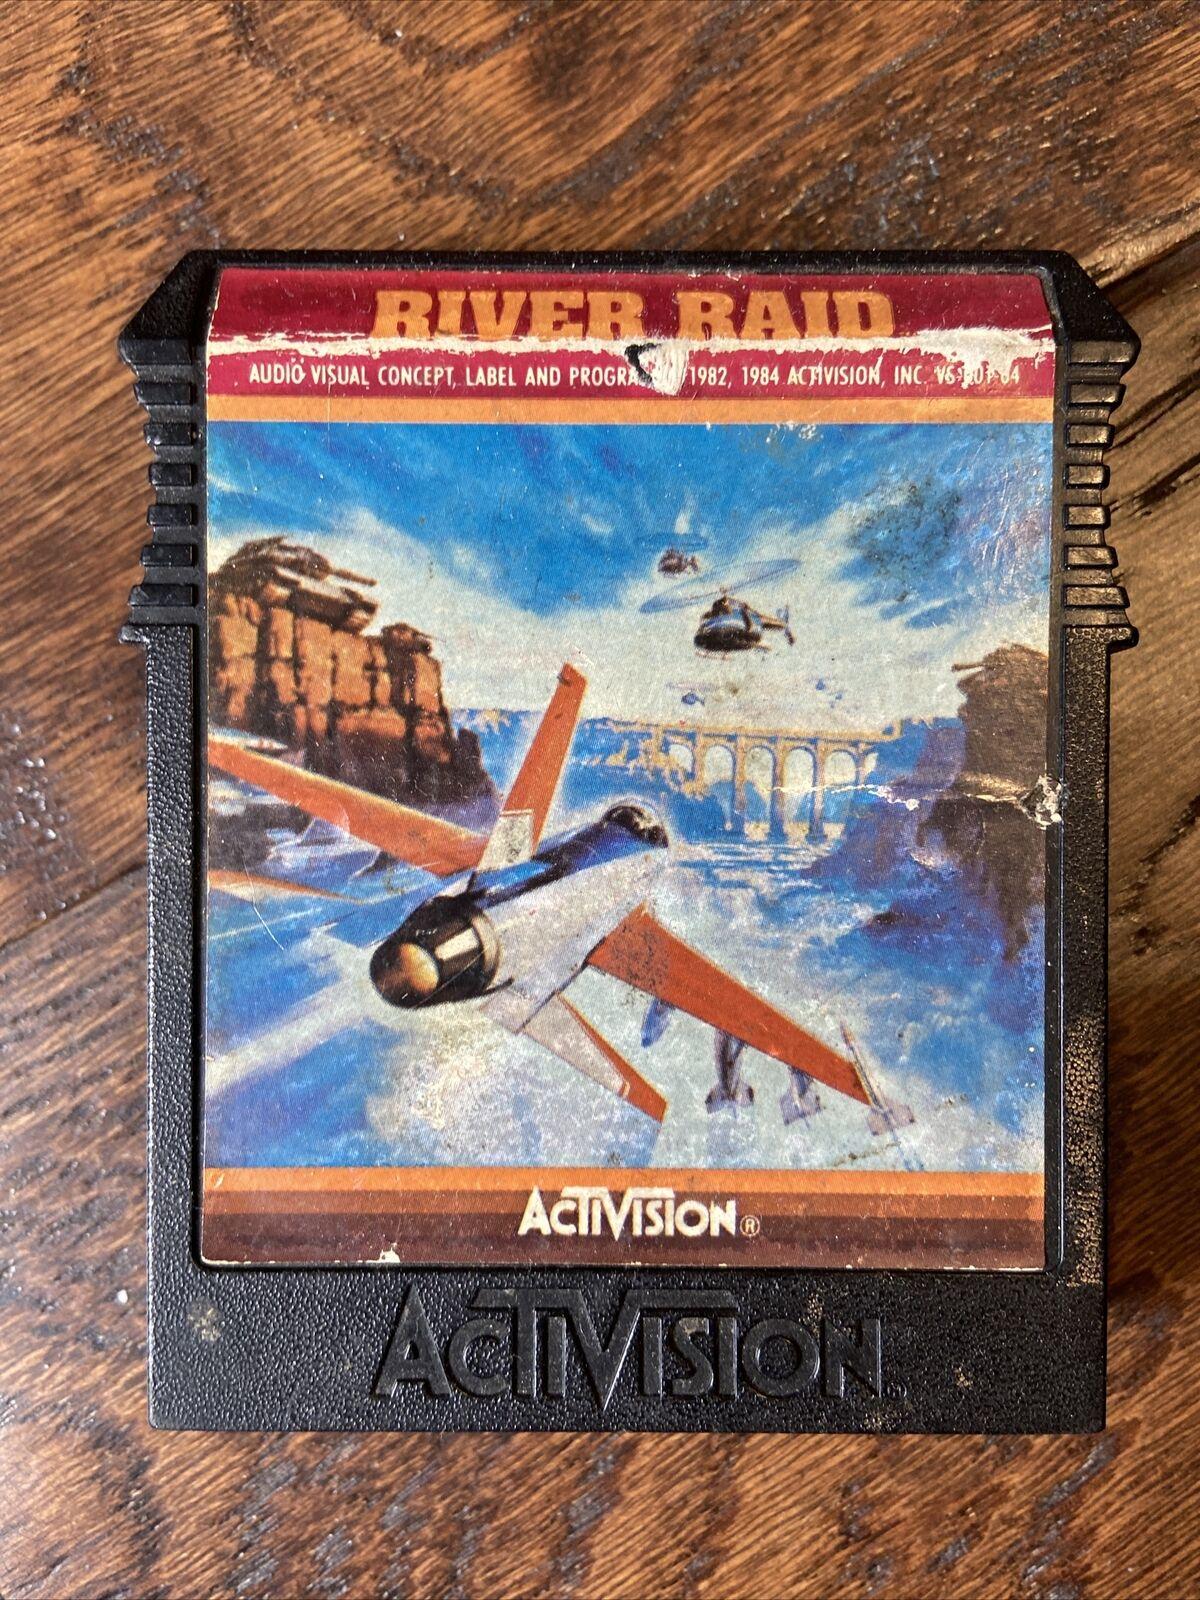 A River Raid cartridge for the Atari 800, circa 1983, Neolithic age © zabhi-32 via eBay